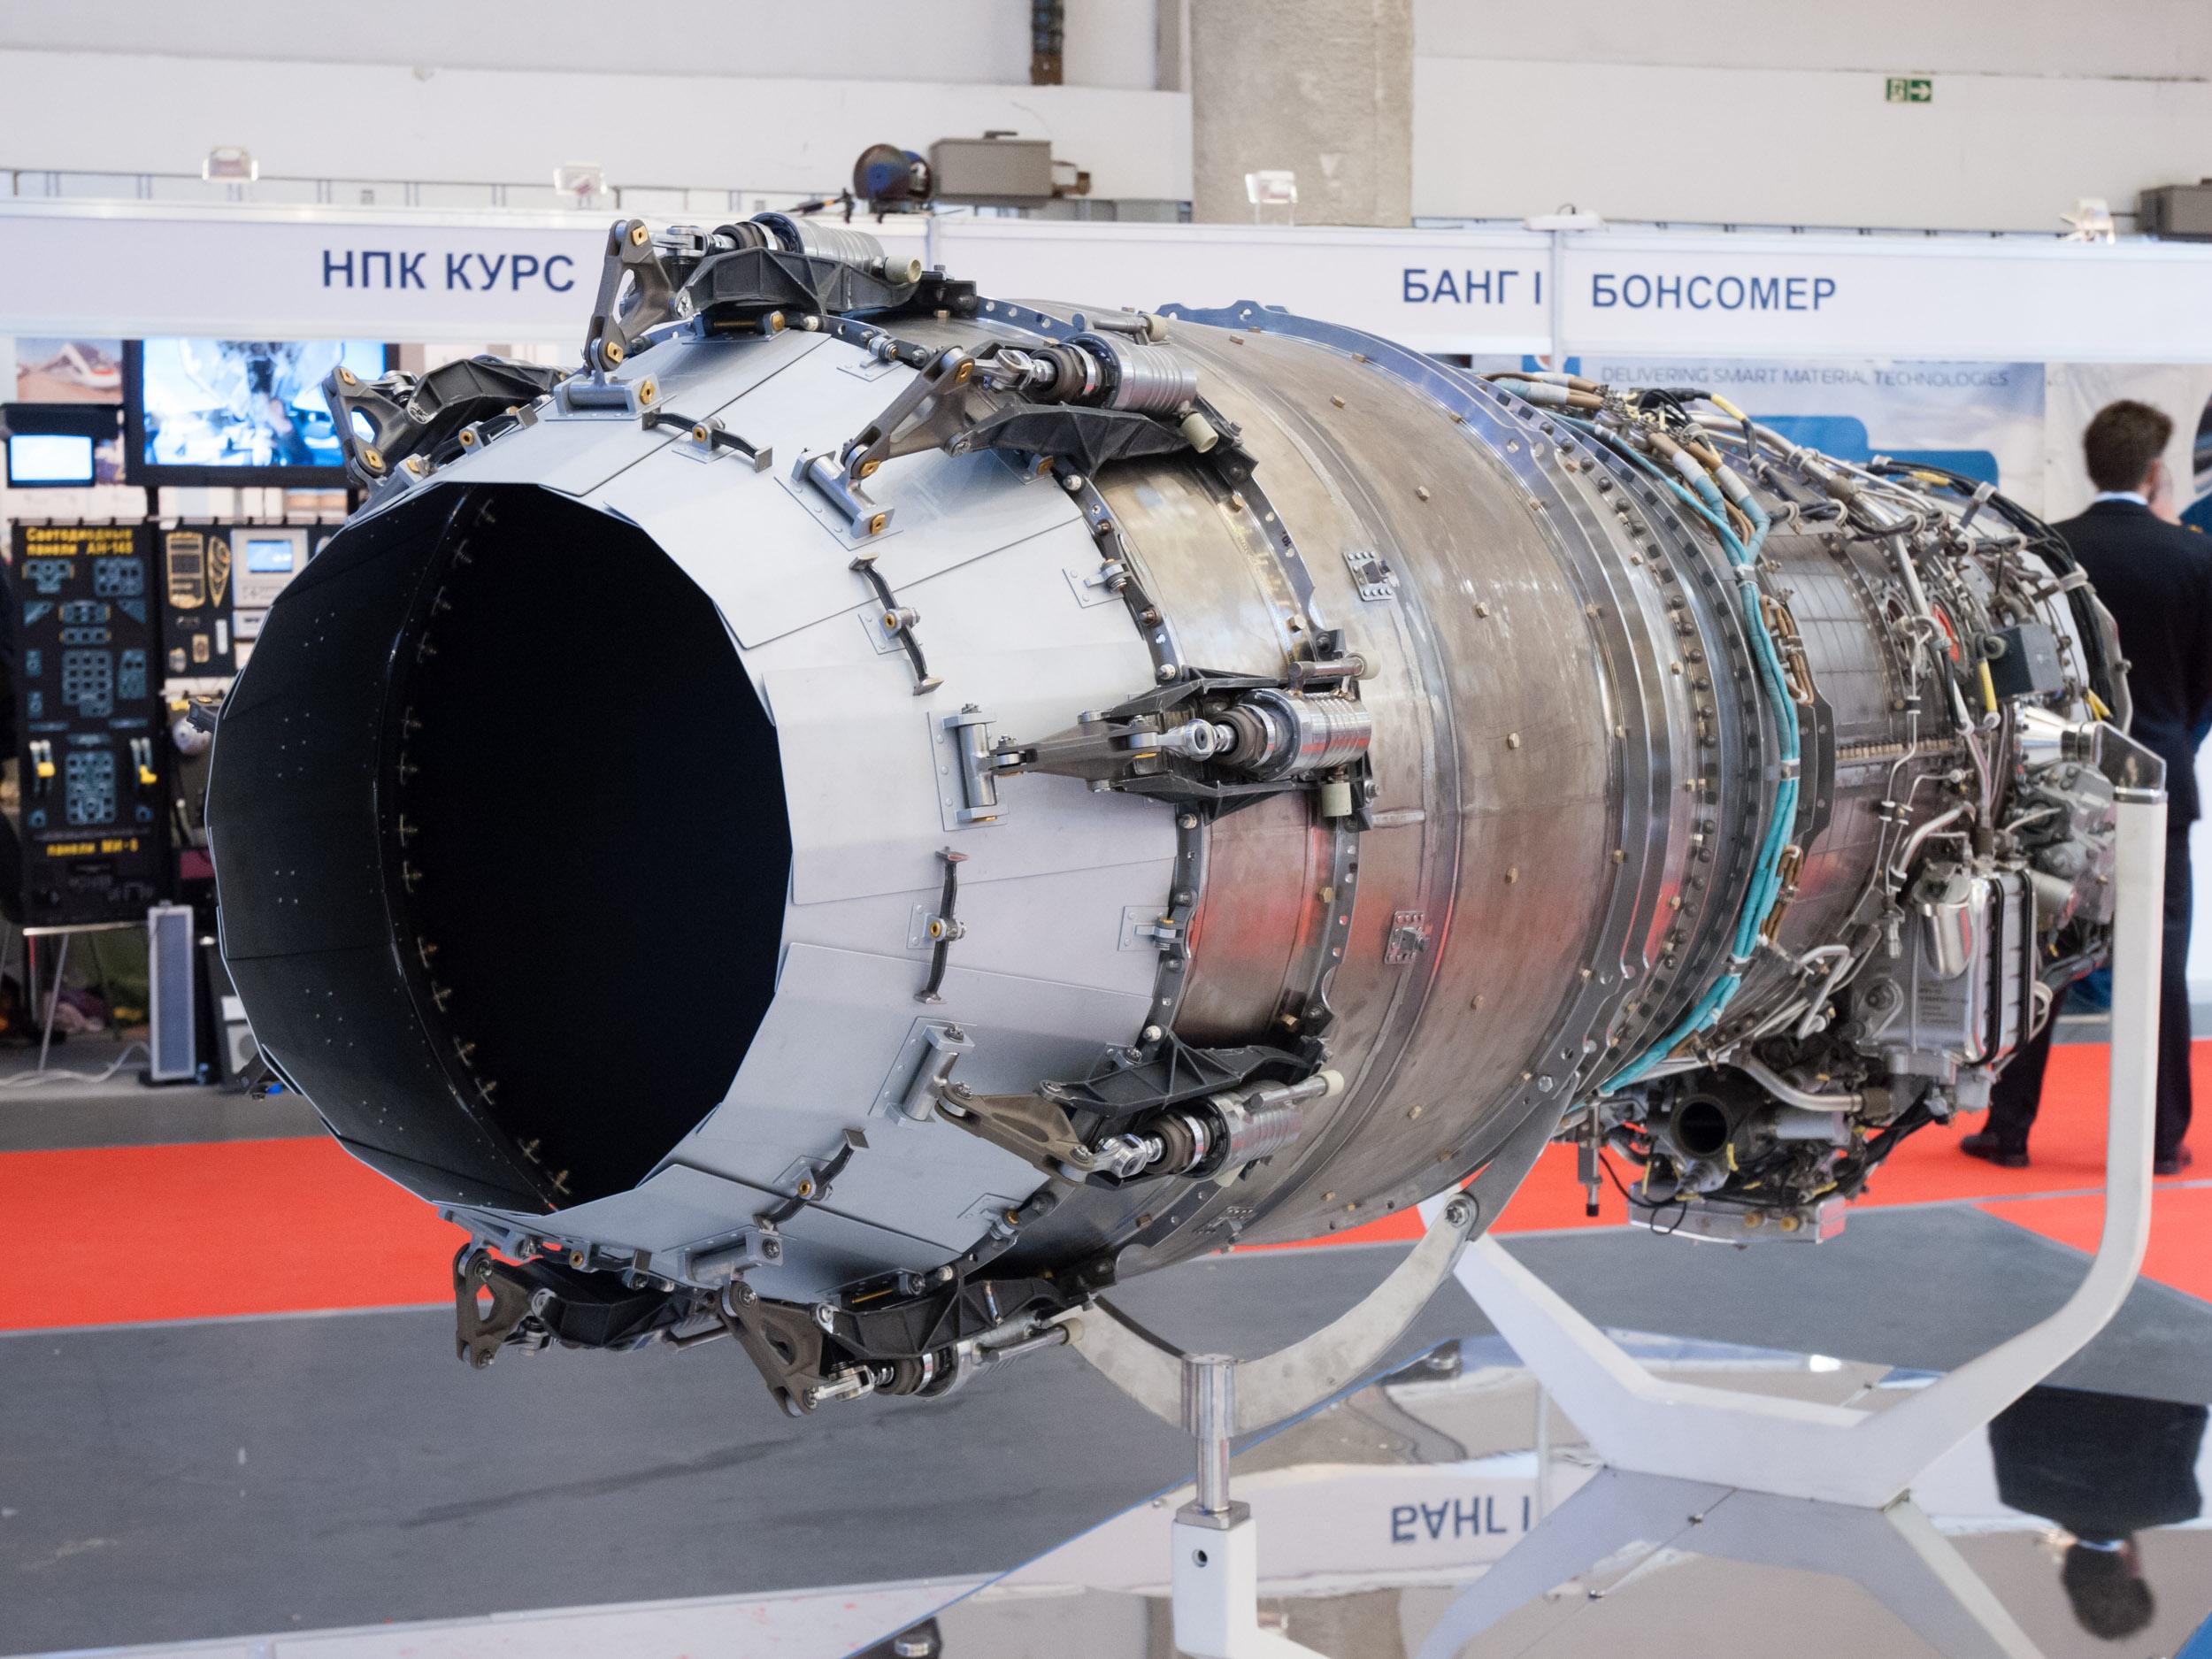 File:Motor Sich AI-322F engine, Kyiv 2018, 101.jpg - Wikimedia Commons